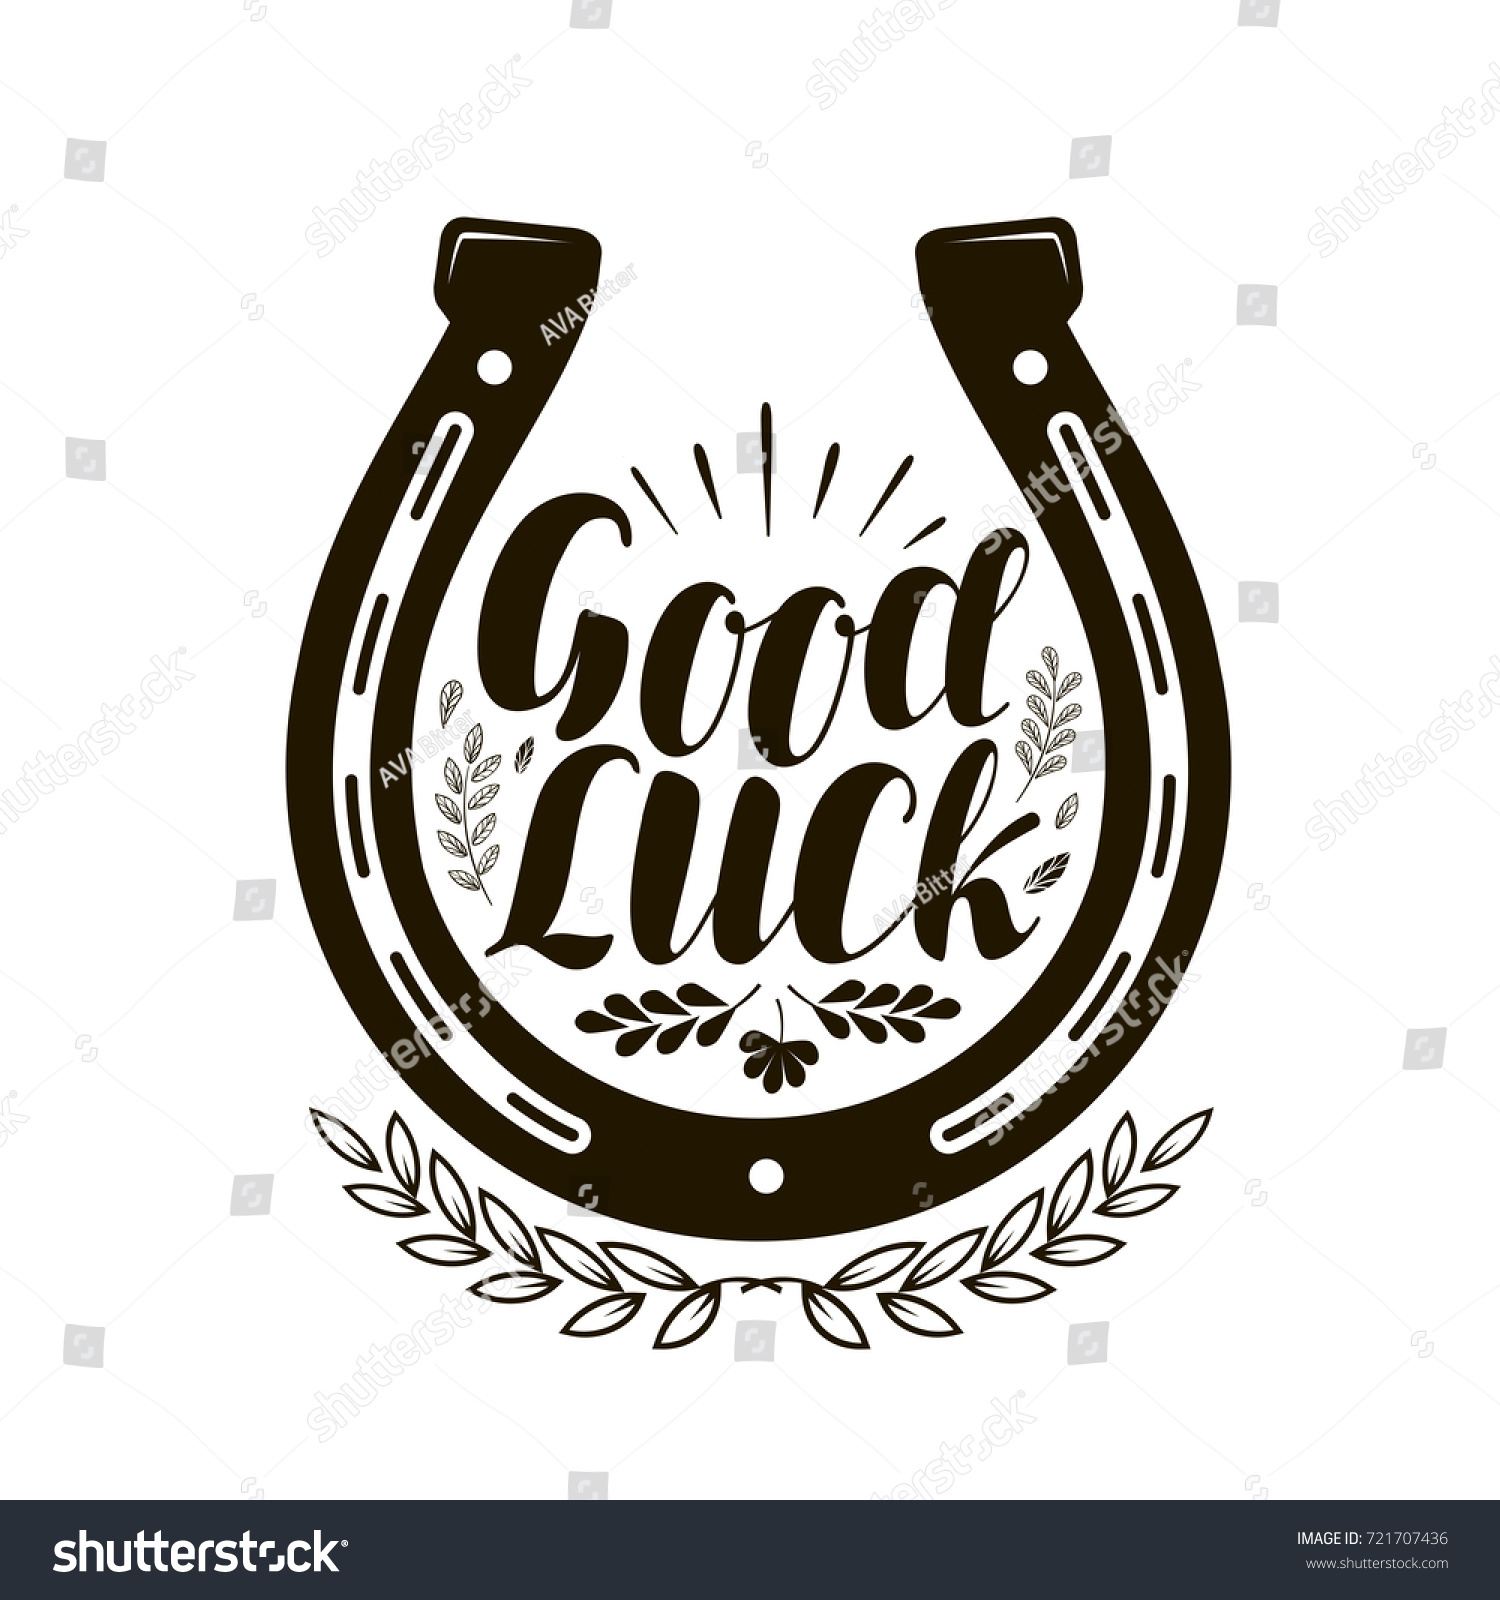 Horseshoe symbol label good luck lettering imagem vetorial de horseshoe symbol or label good luck lettering vector illustration biocorpaavc Choice Image